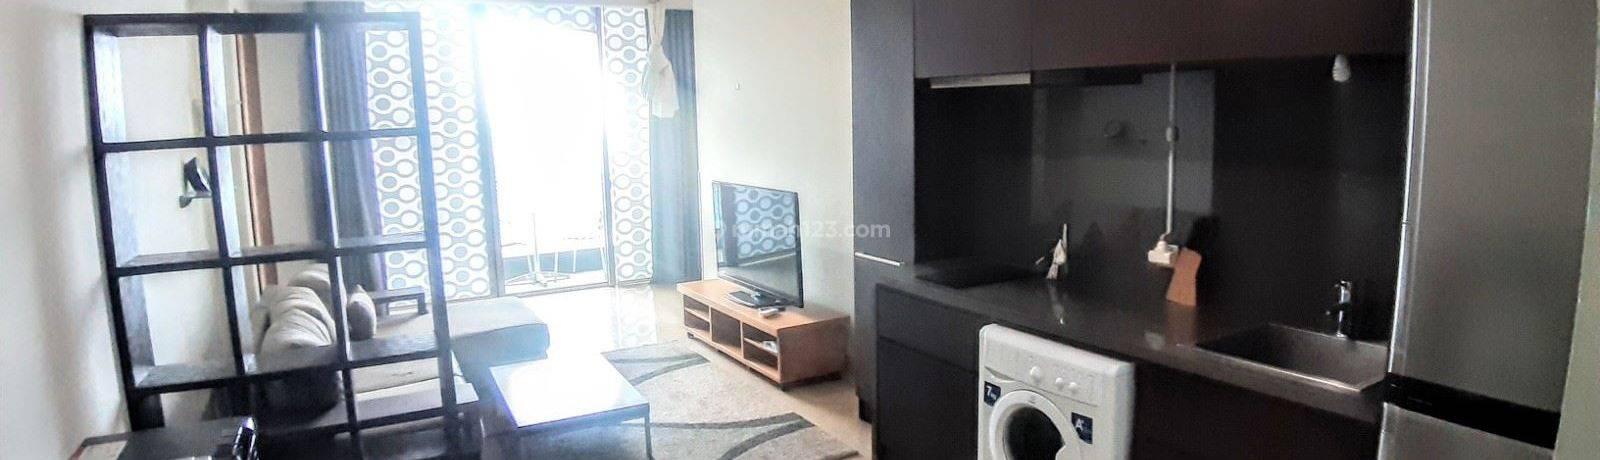 Apartemen Residence 8 Senopati 1BR, Jakarta Selatan